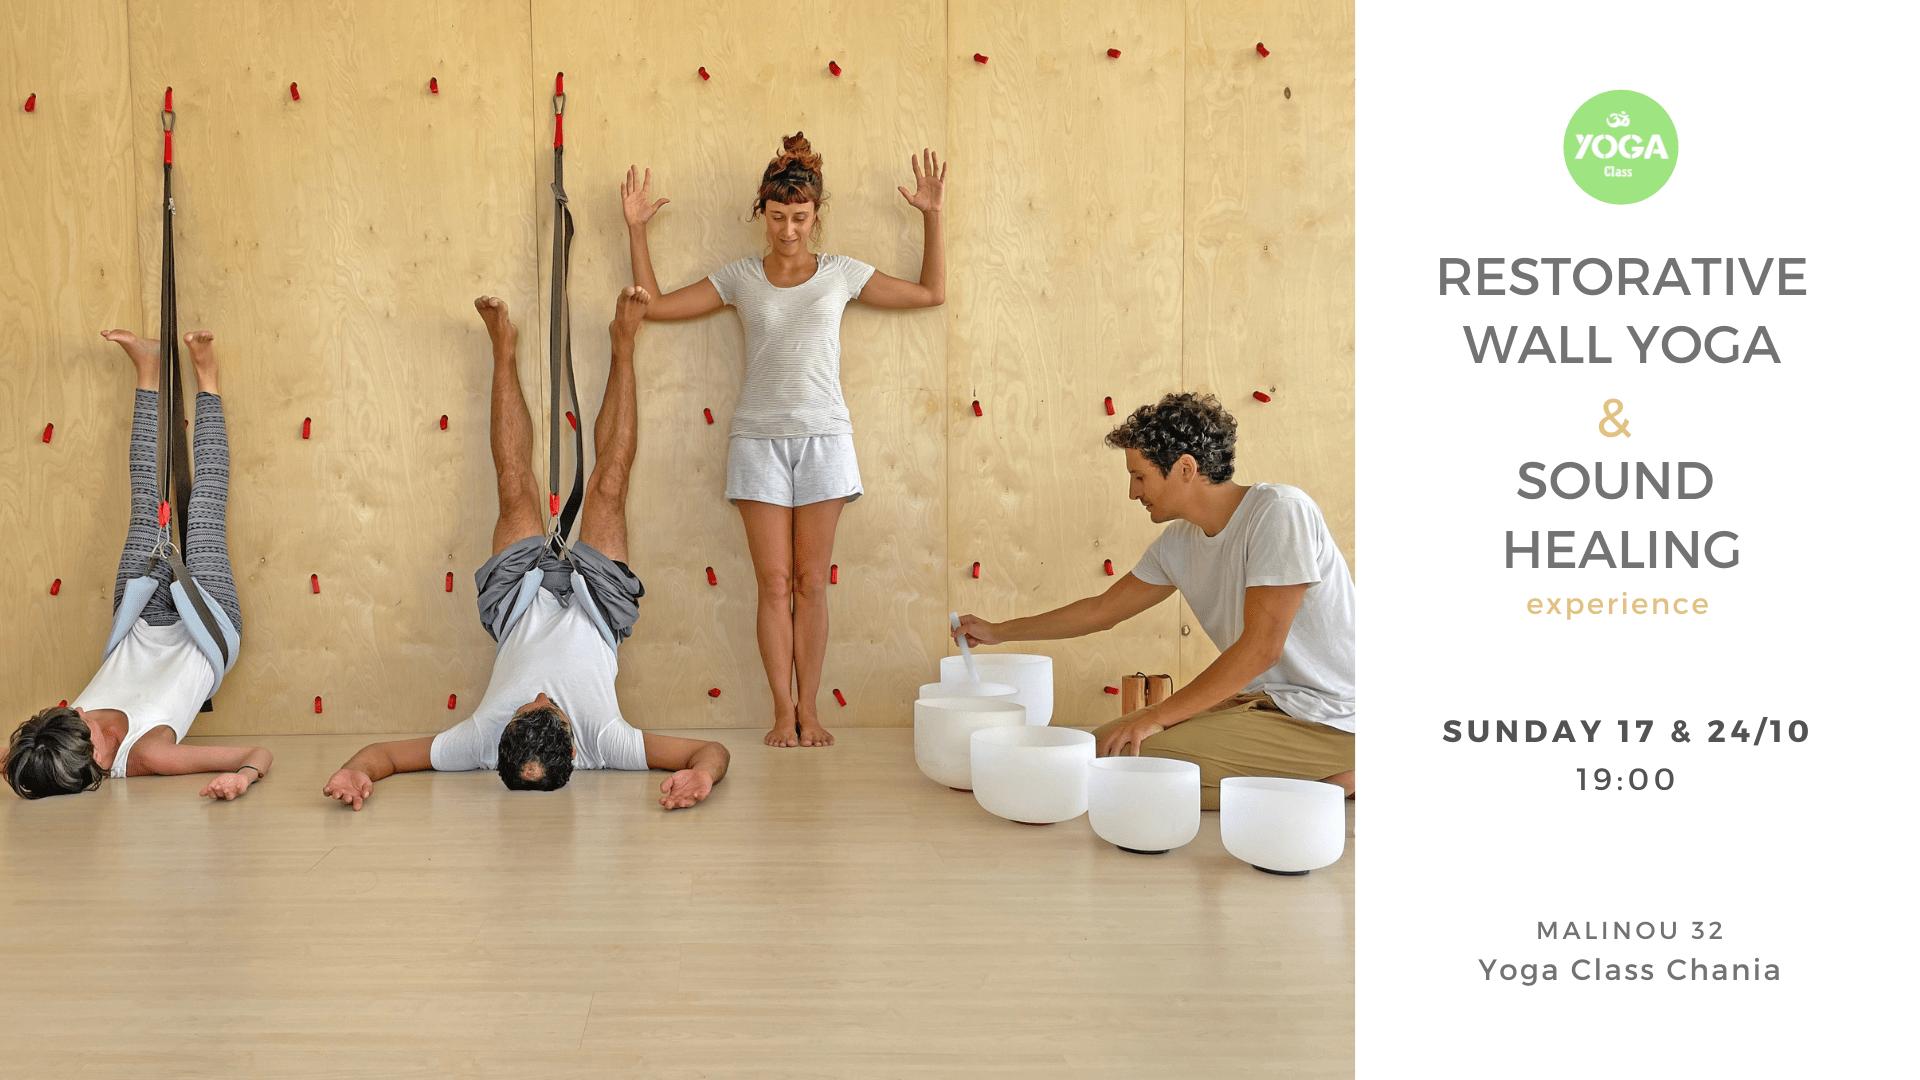 Restorative wall yoga & sound healing experience at Yoga Class Chania – 17-24 October